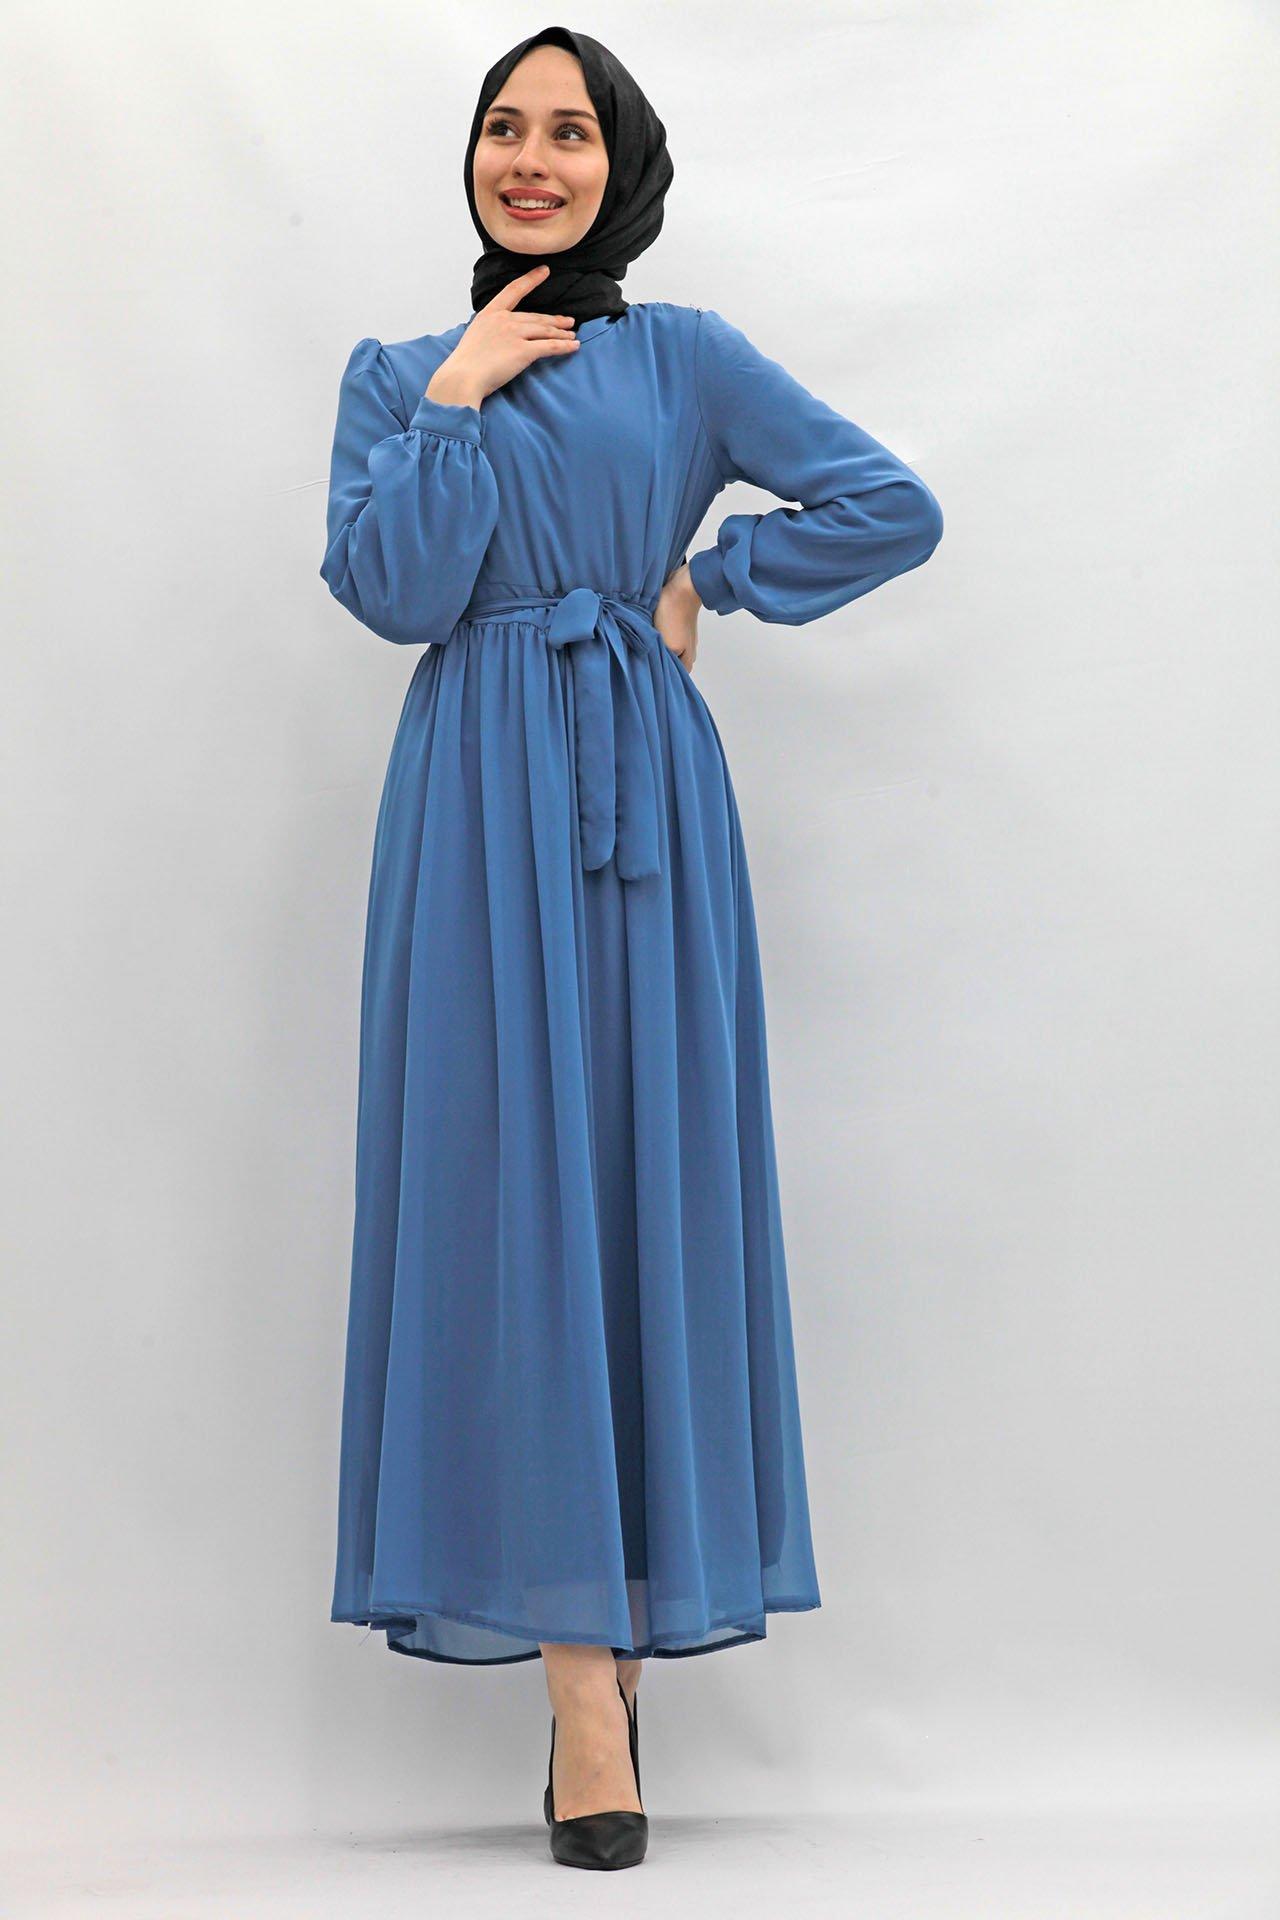 GİZAGİYİM - Kol Ucu Manşetli Şifon Elbise İndigo